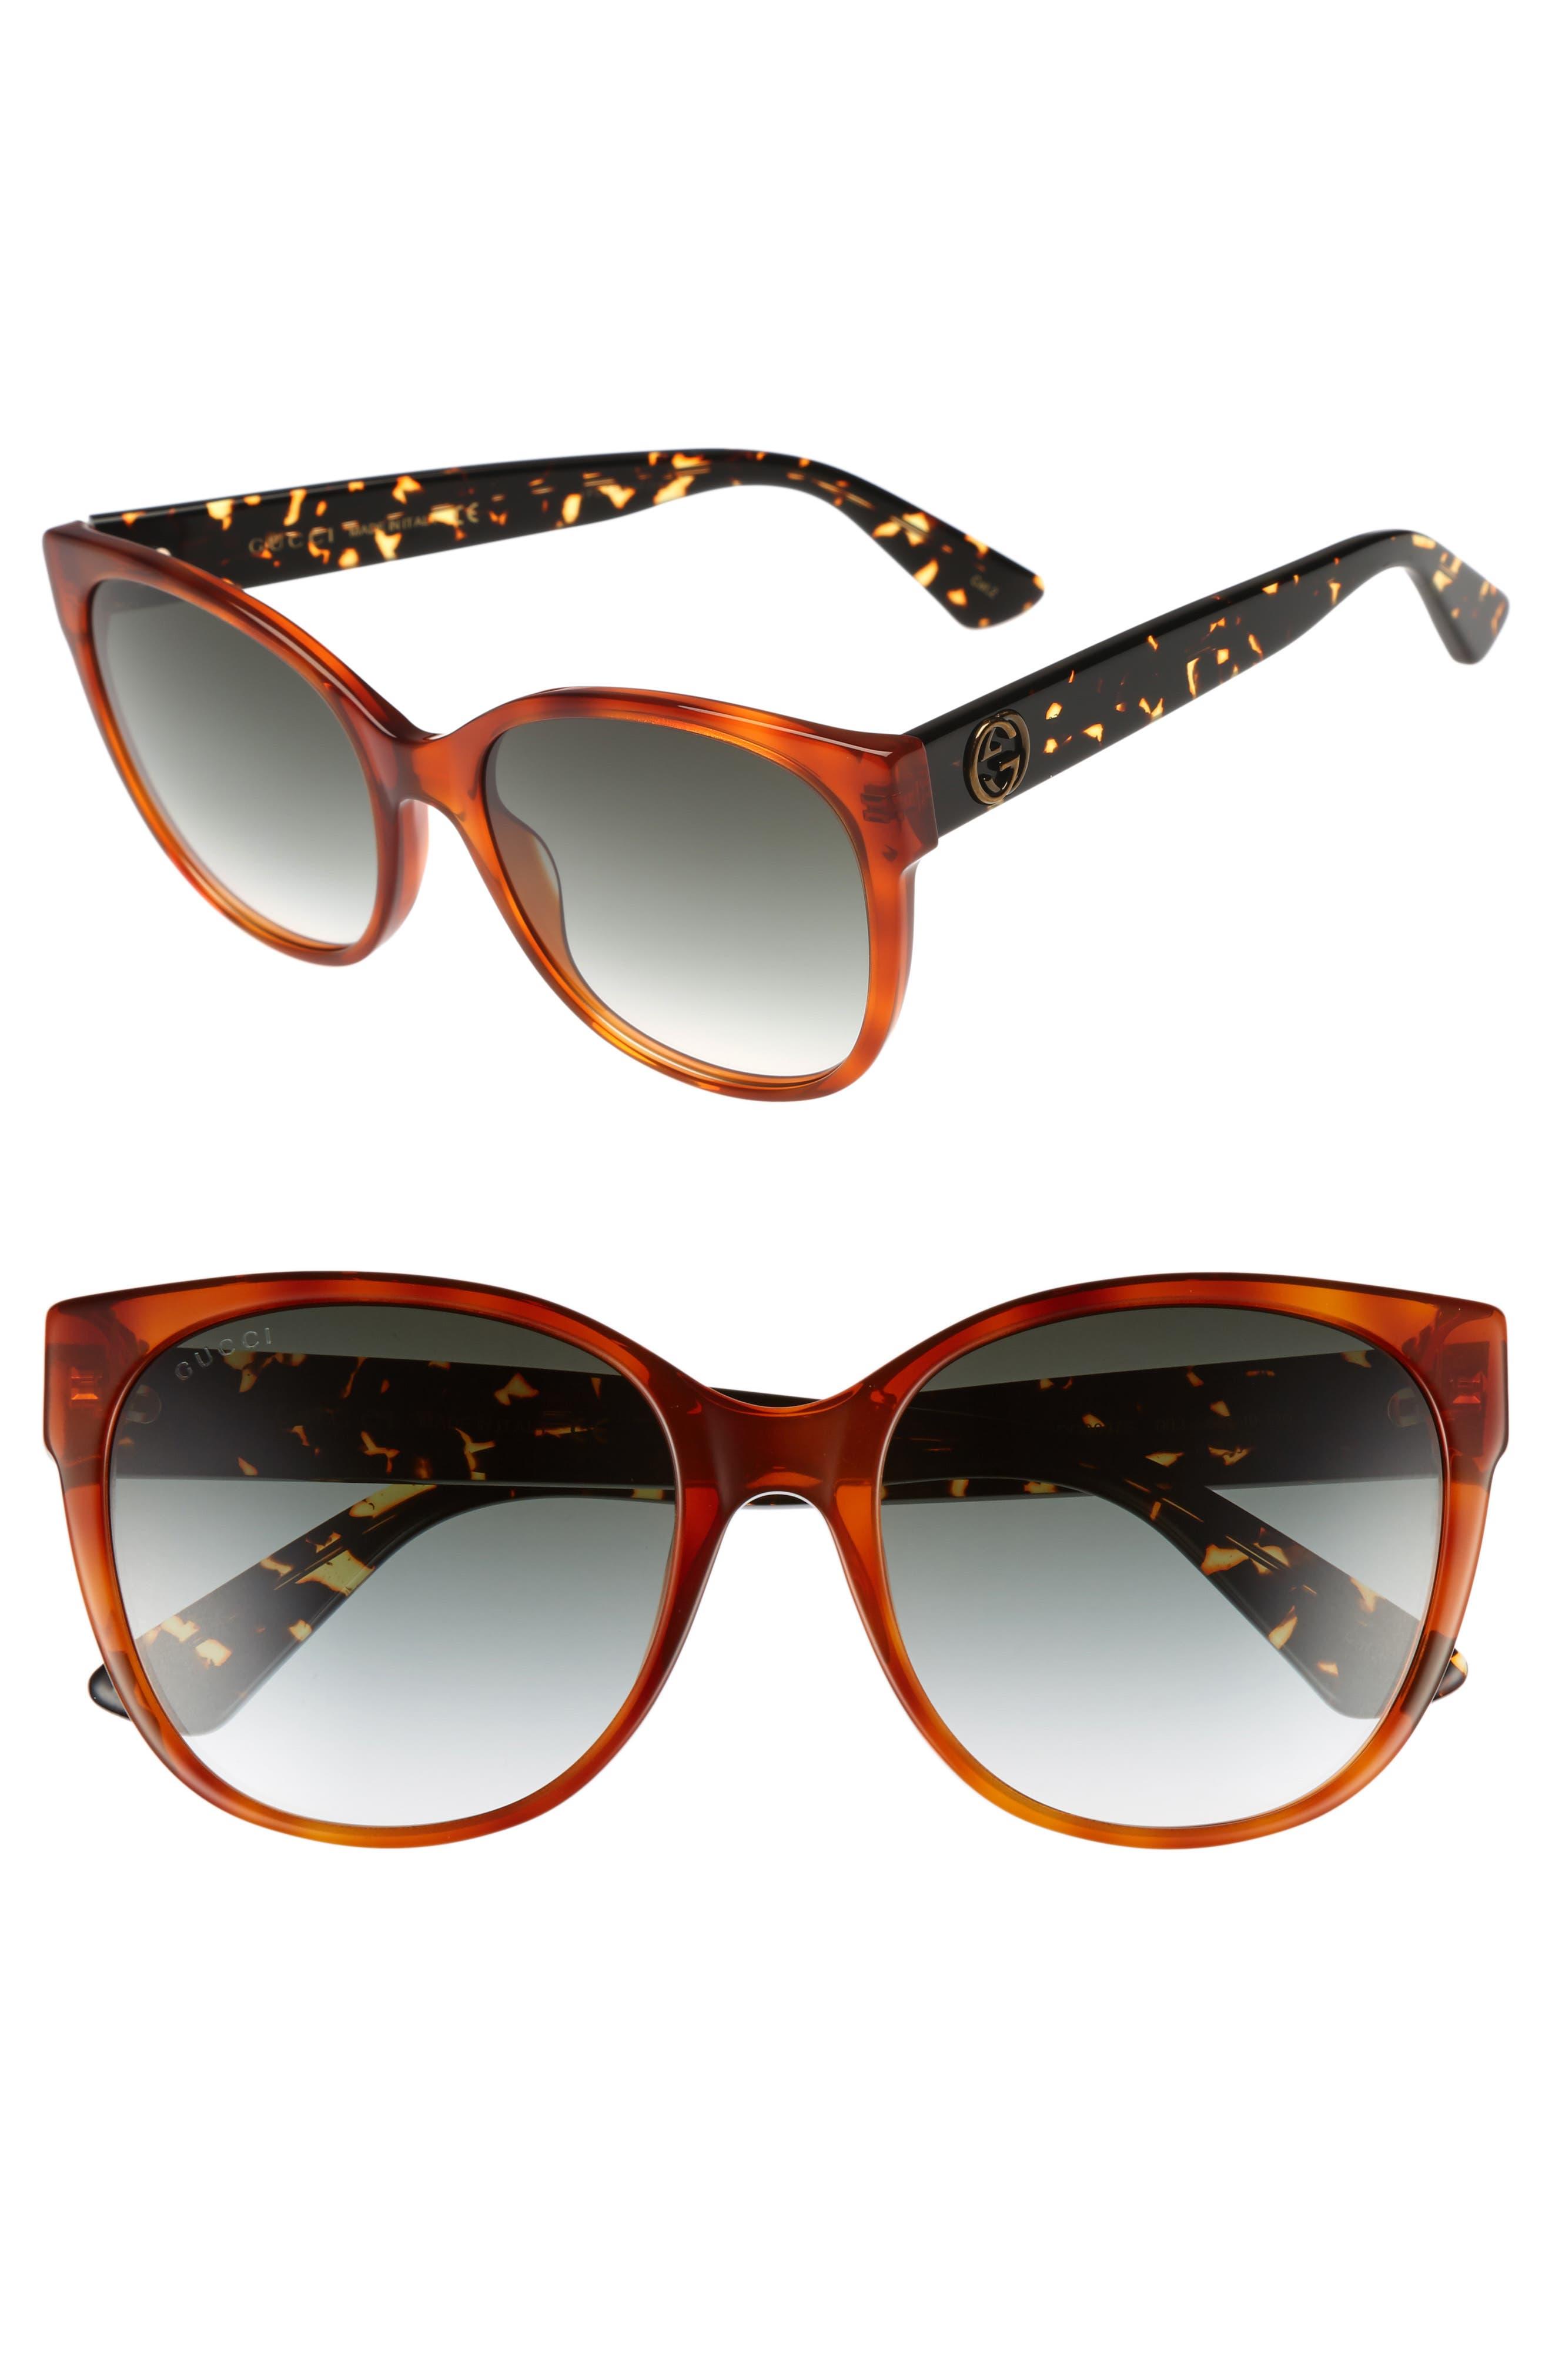 Main Image - Gucci 56mm Cat Eye Sunglasses